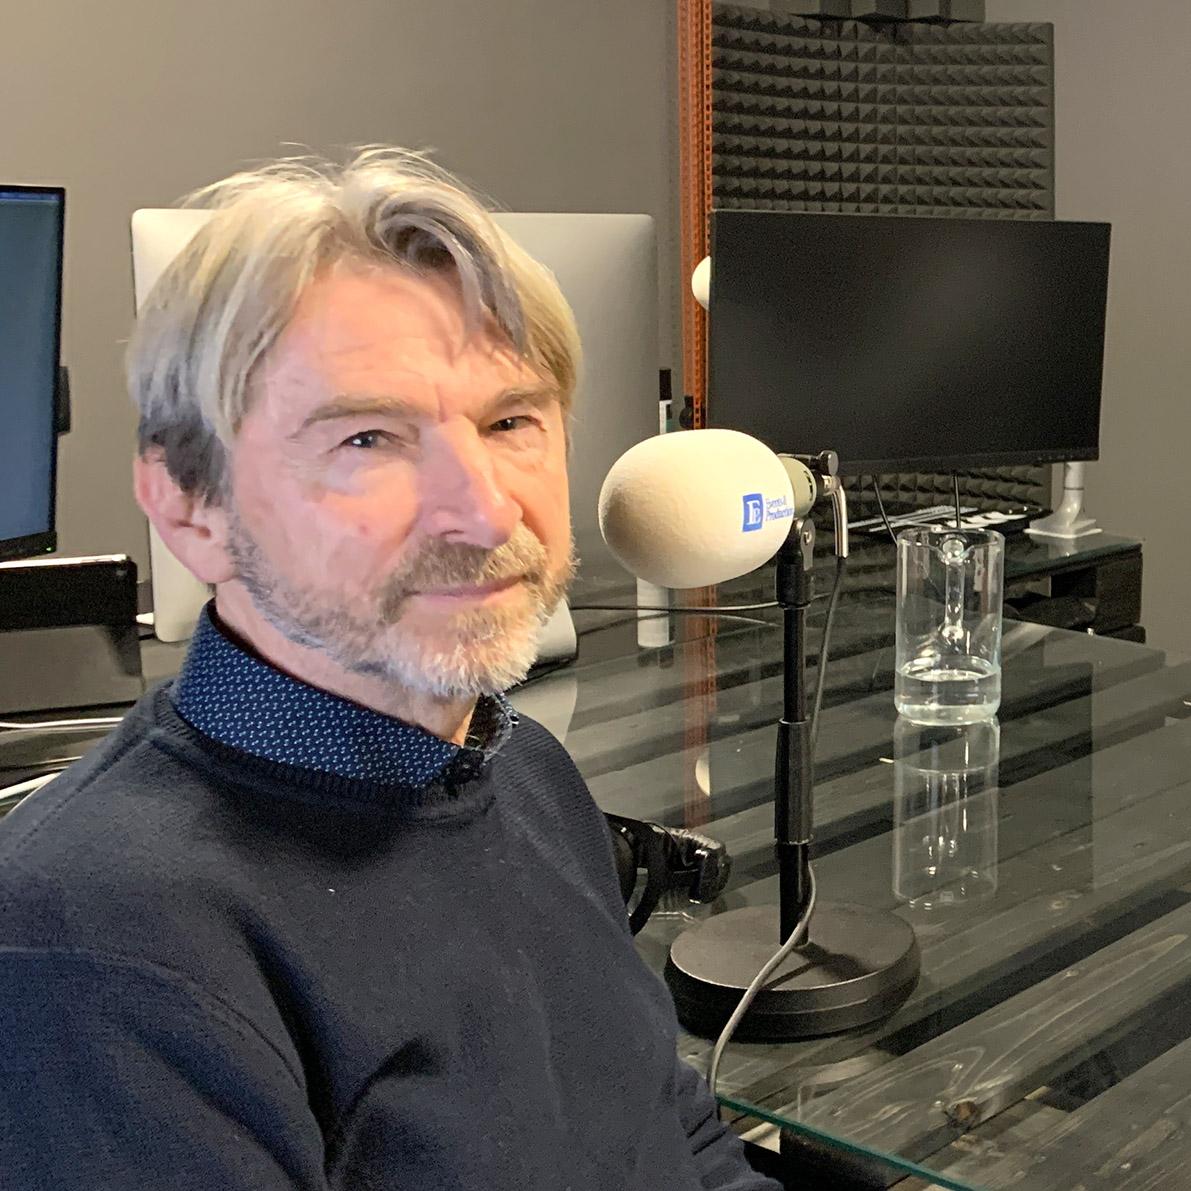 Pavel Vosoba